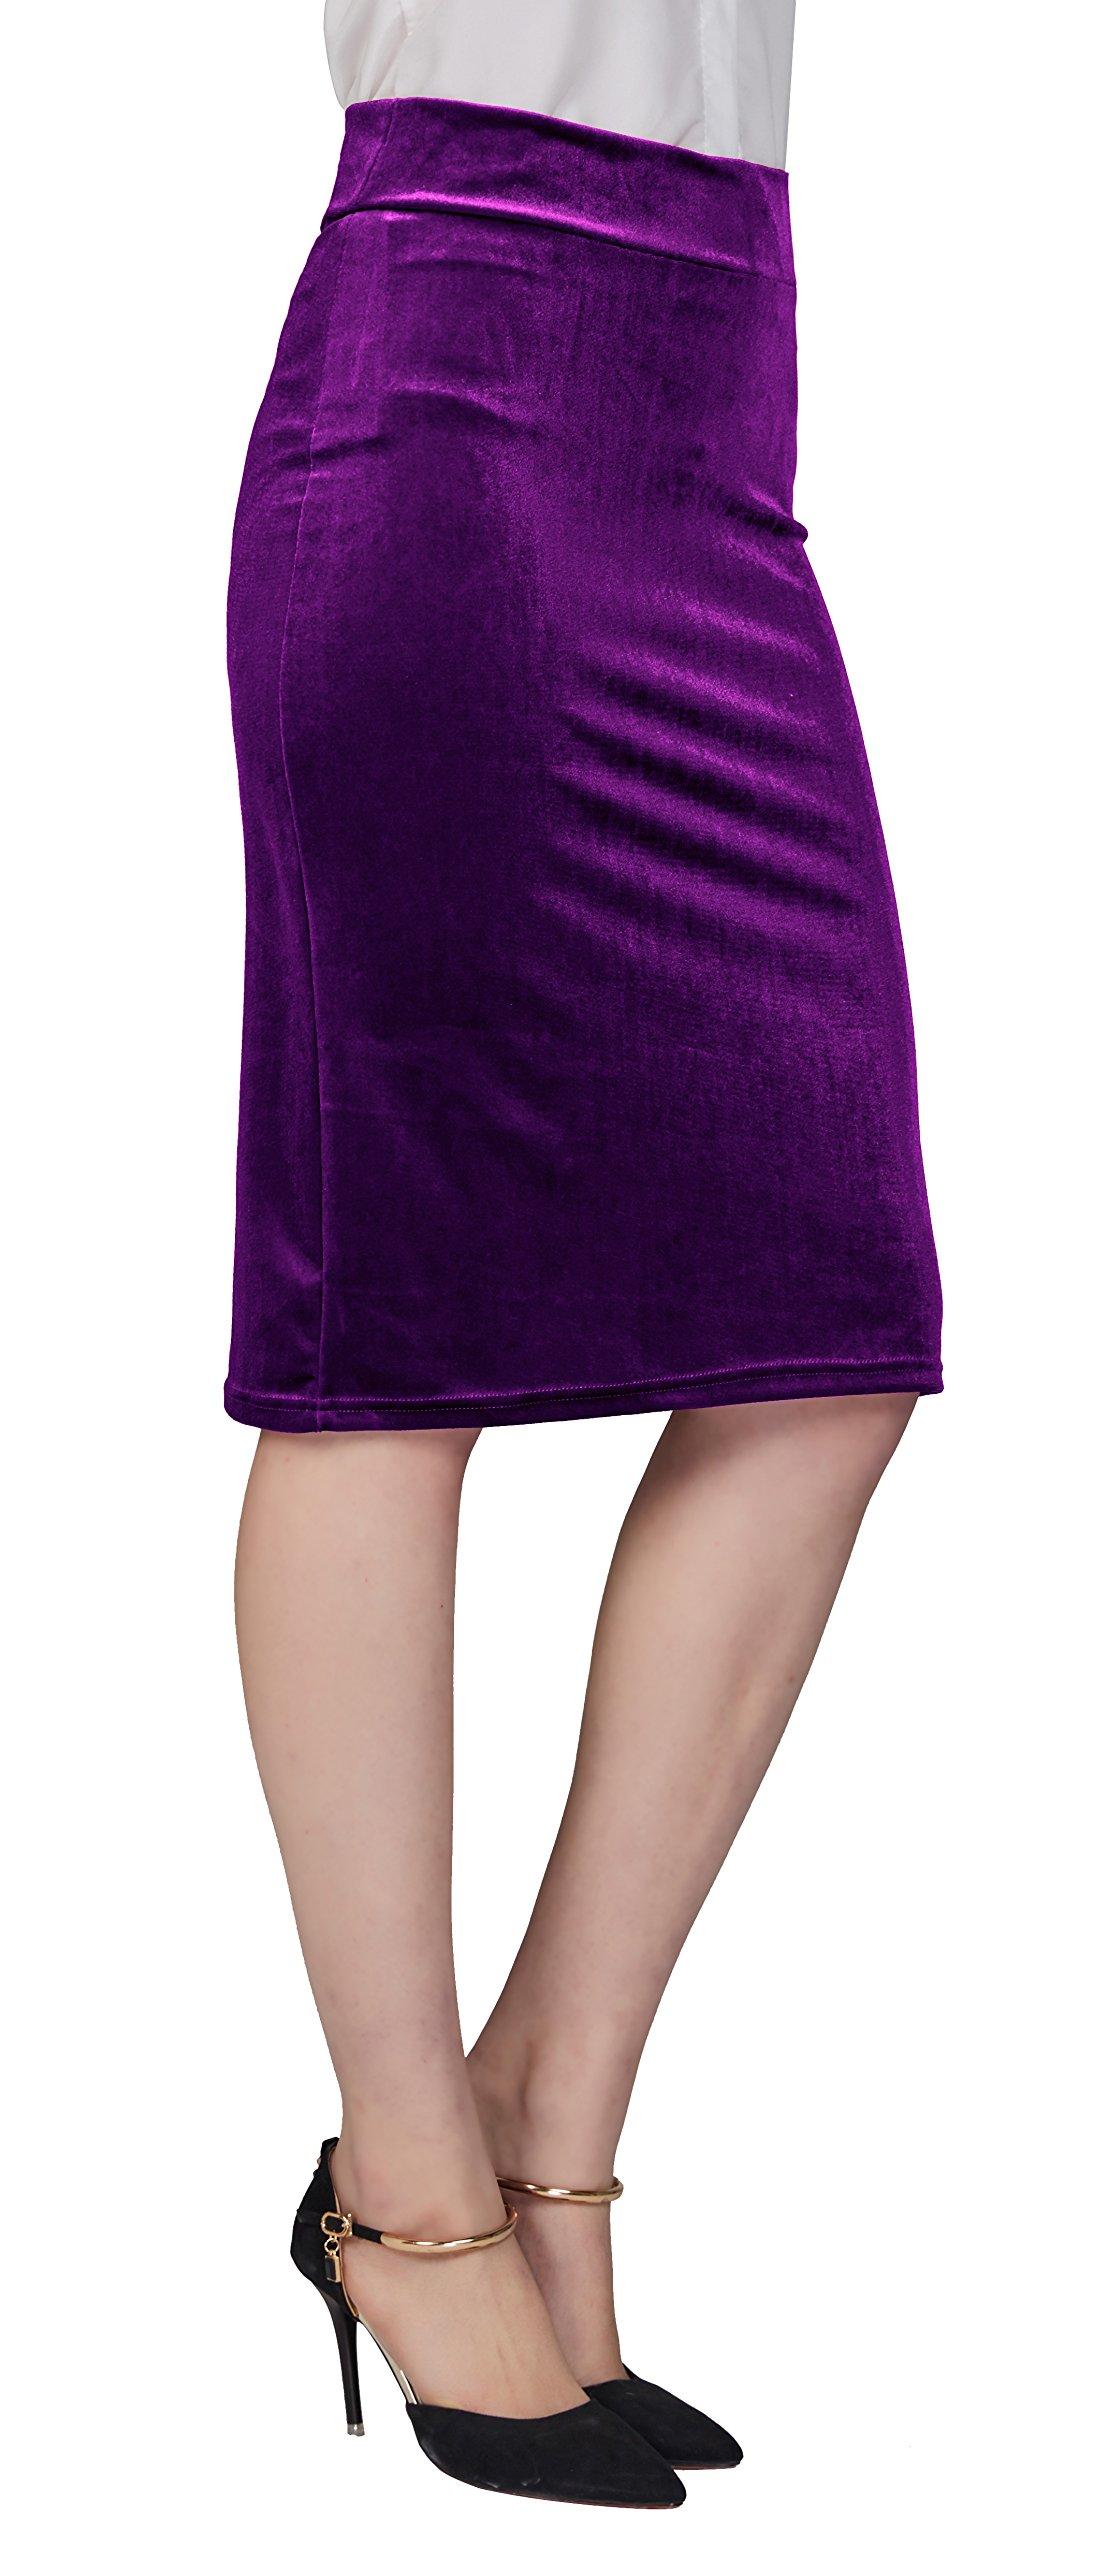 Urban CoCo Women's Elastic Waist Stretch Velvet Bodycon Pencil Skirt (L, Purple-Midi)